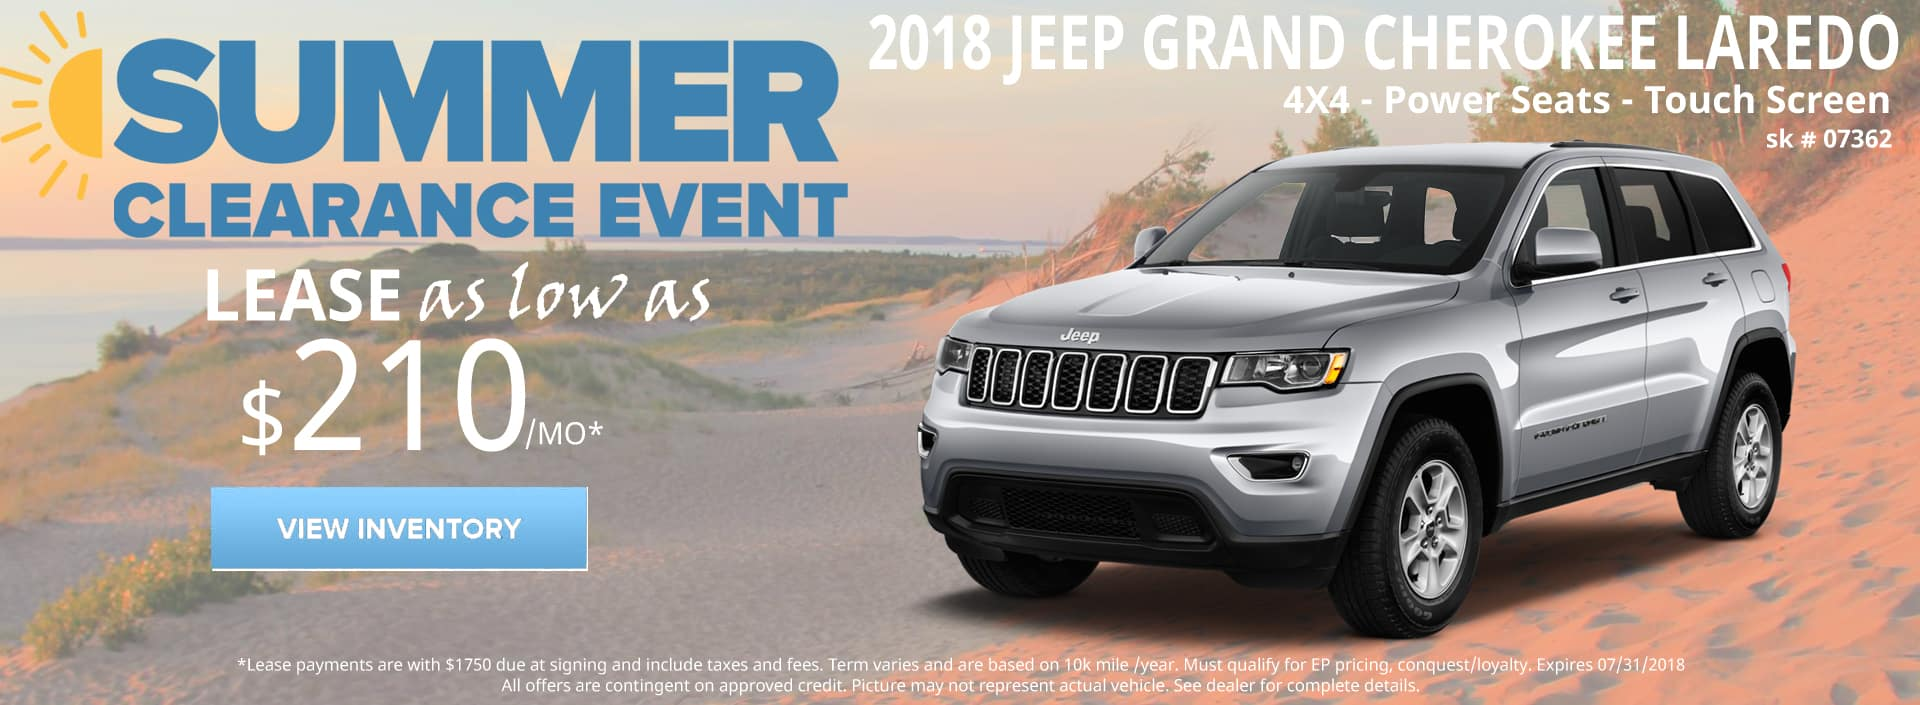 July 2018 Special Jeep Grand Cherokee Laredo